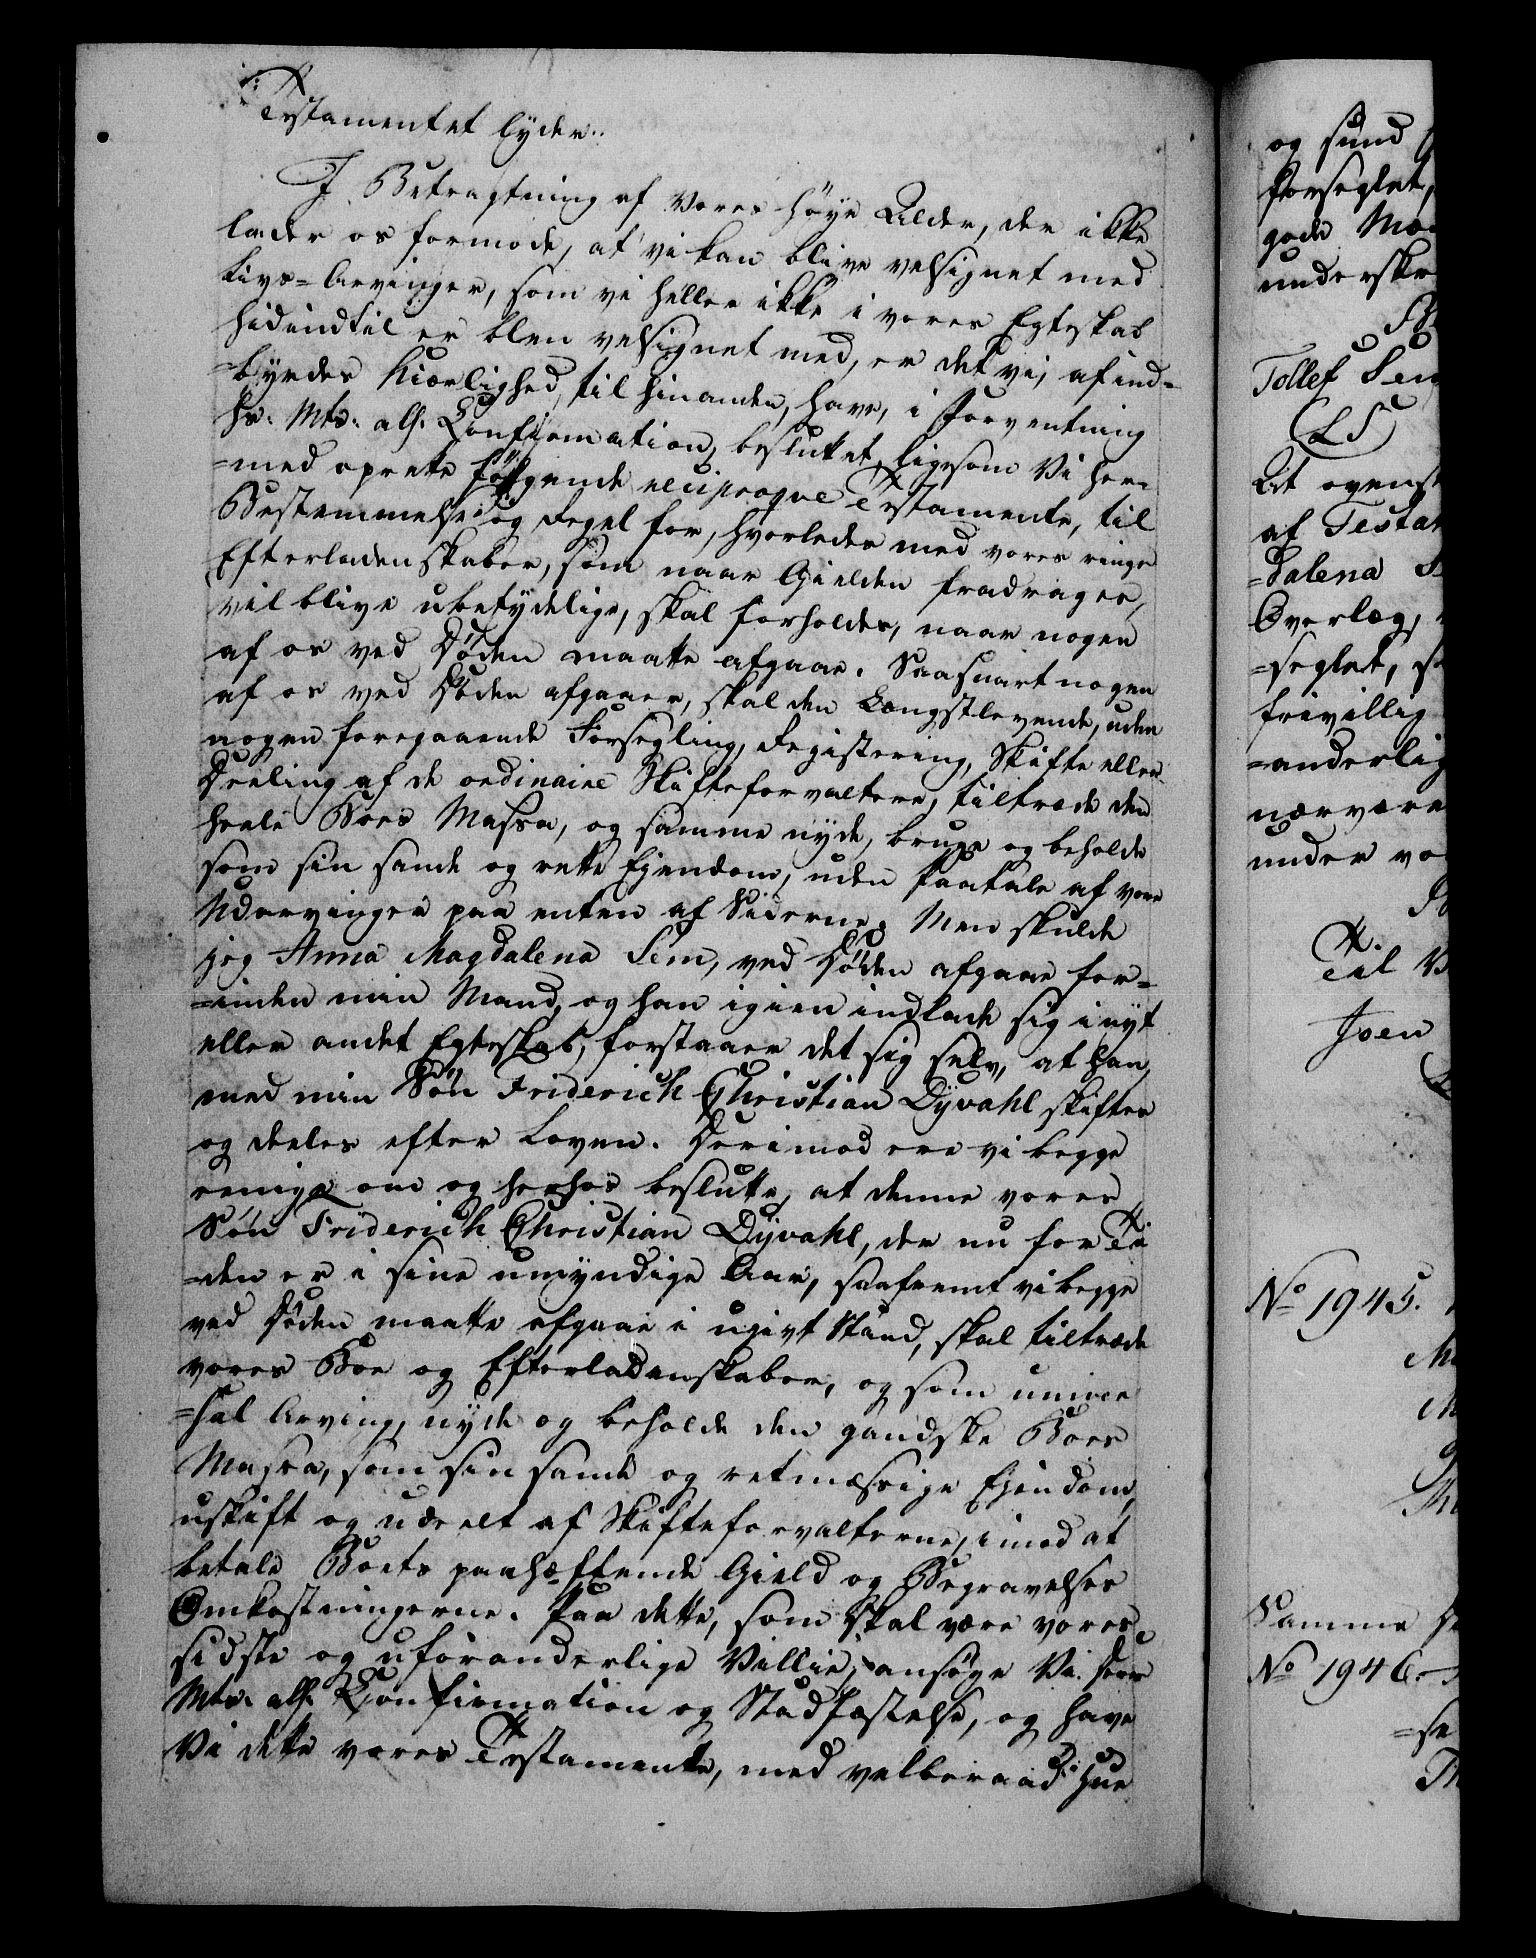 RA, Danske Kanselli 1800-1814, H/Hf/Hfb/Hfba/L0001: Registranter, 1800-1801, s. 443b